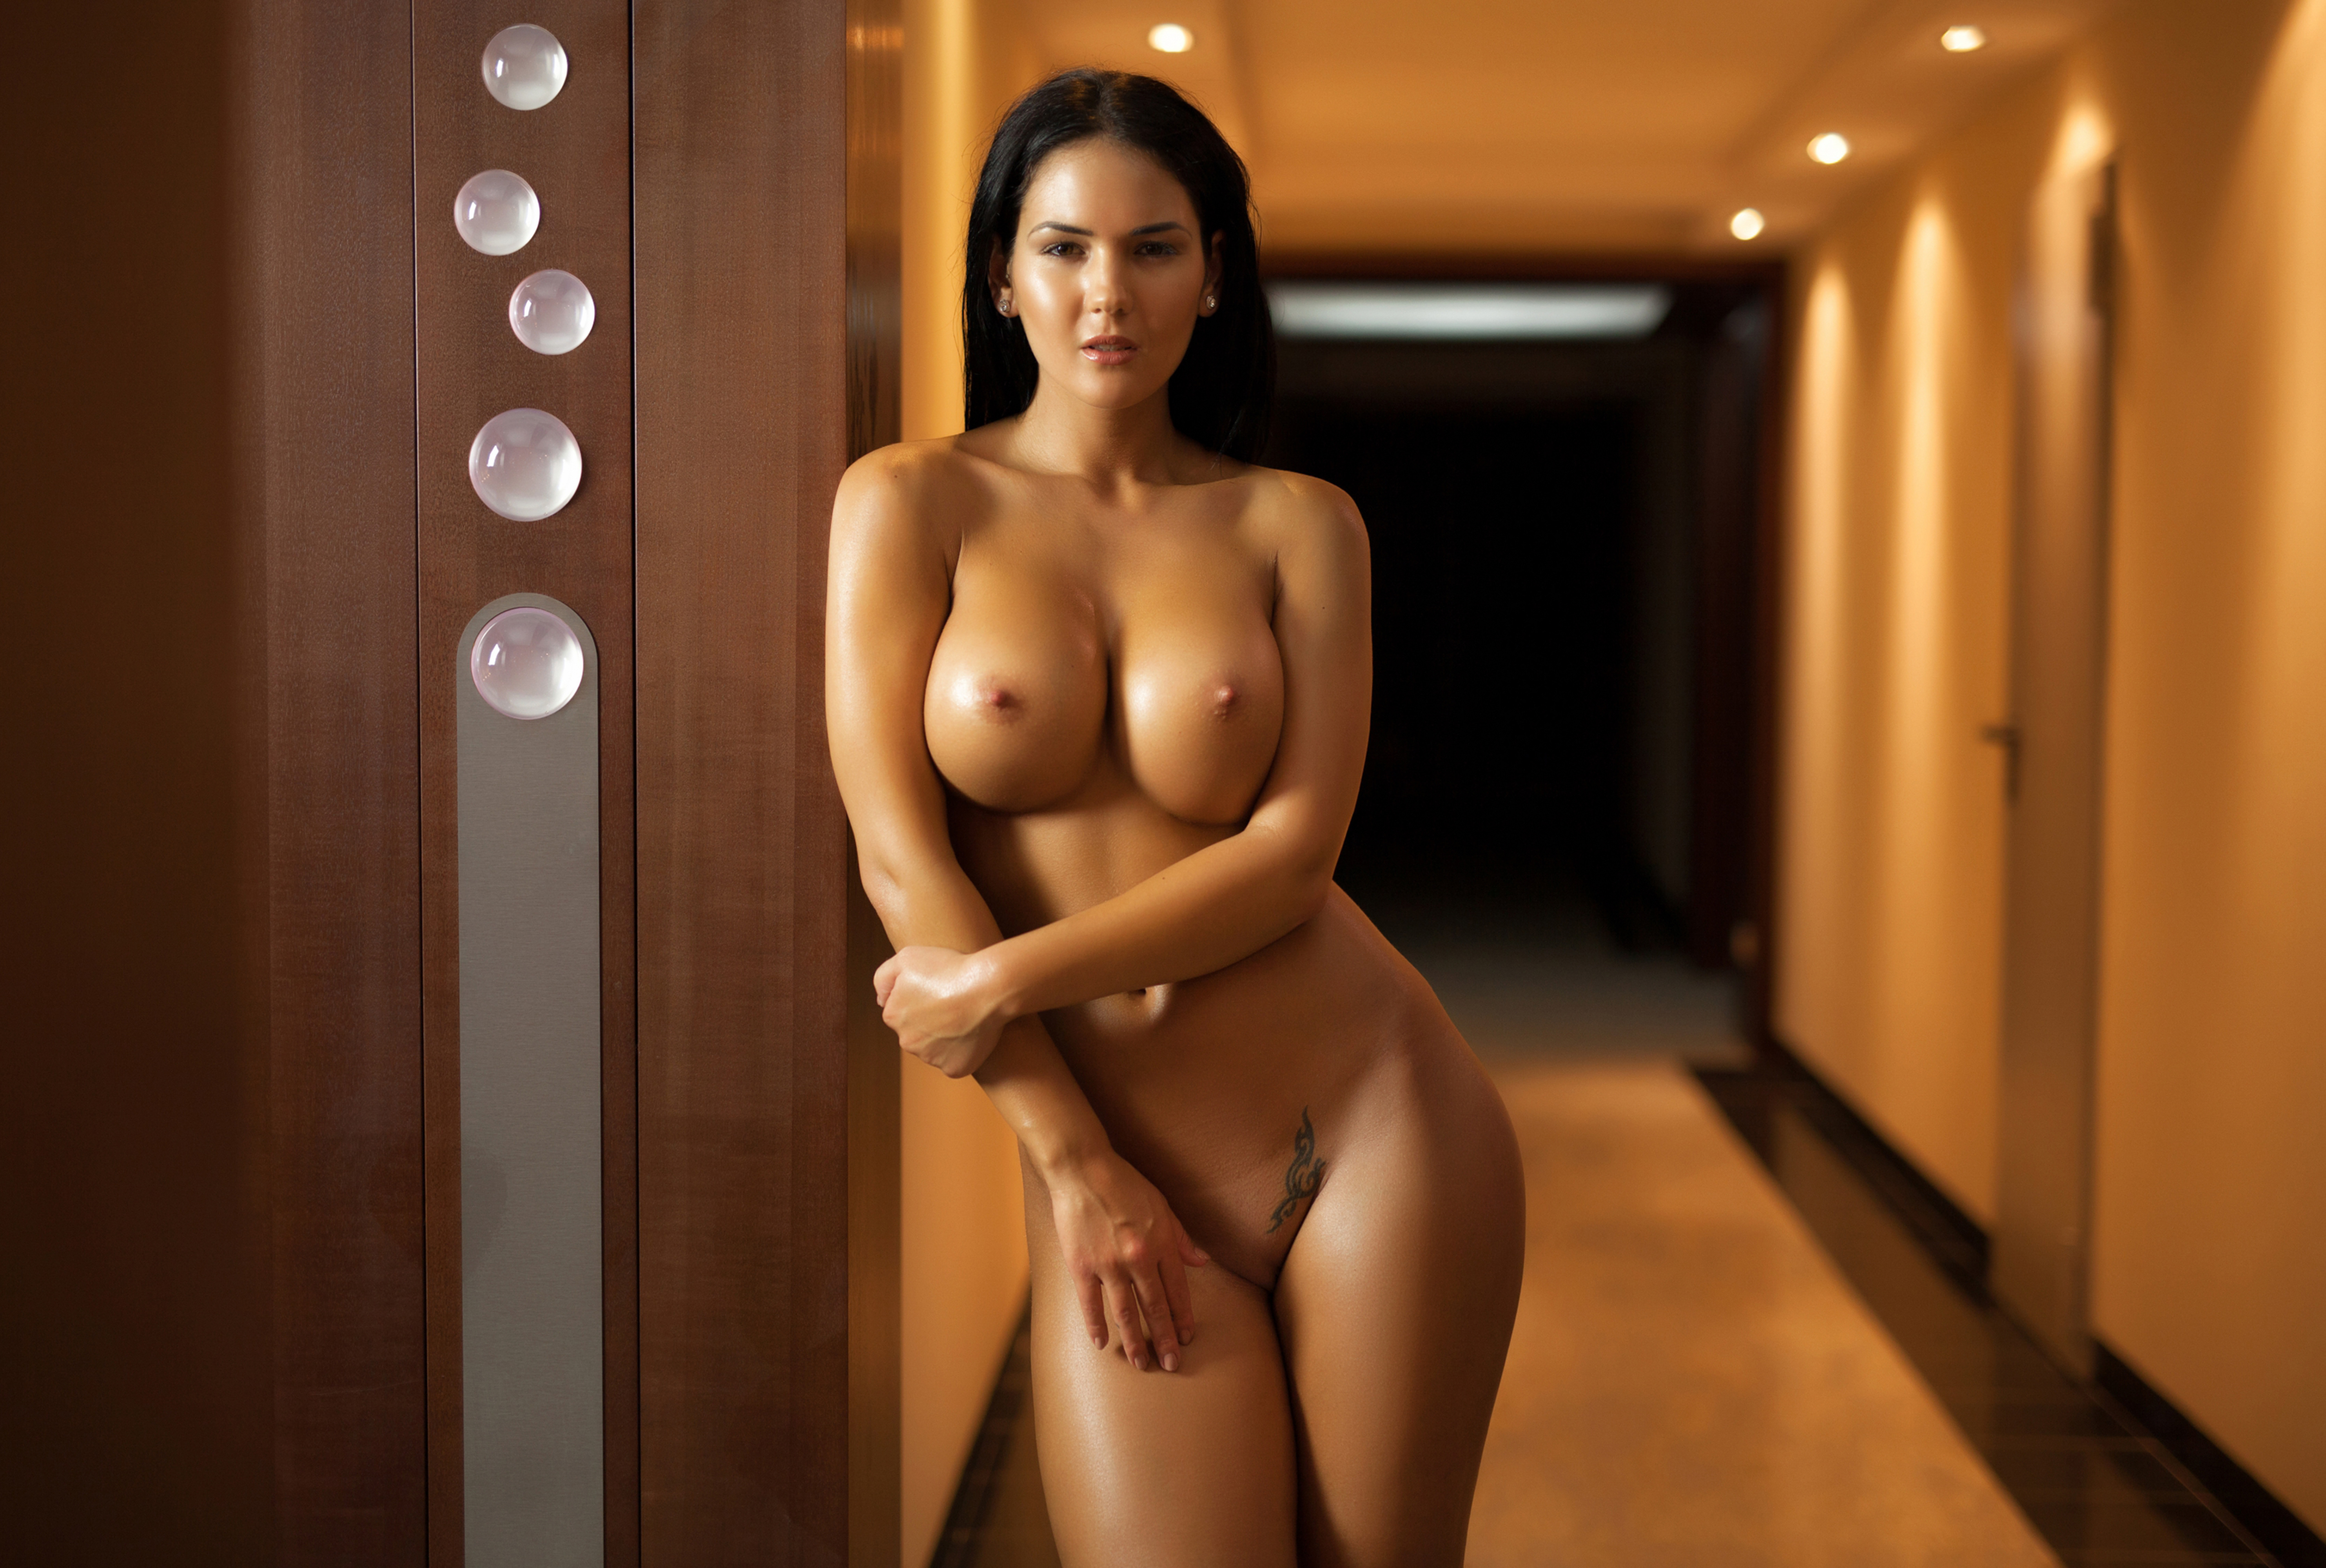 Wallpaper Kendra, Brunette, Boobs, Big Boobs, Naked, Nude -8711